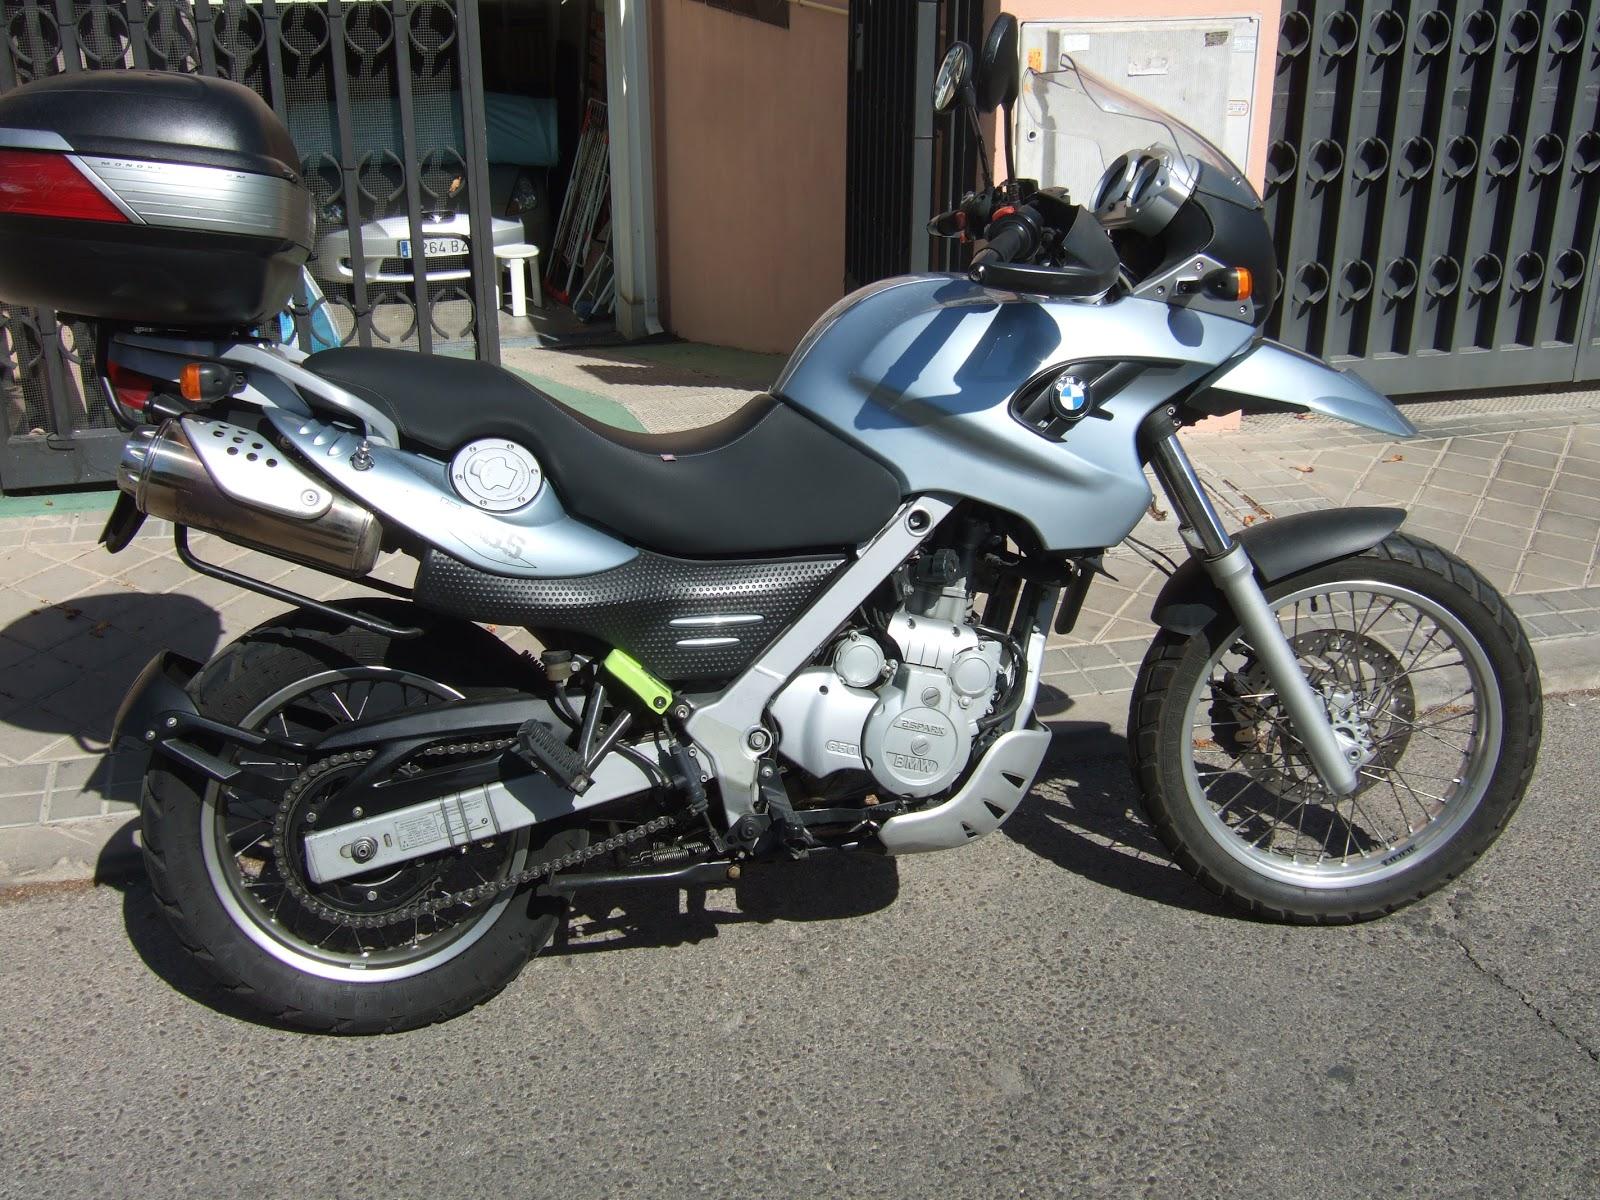 ensanchar un asiento de moto tapizar asiento moto en